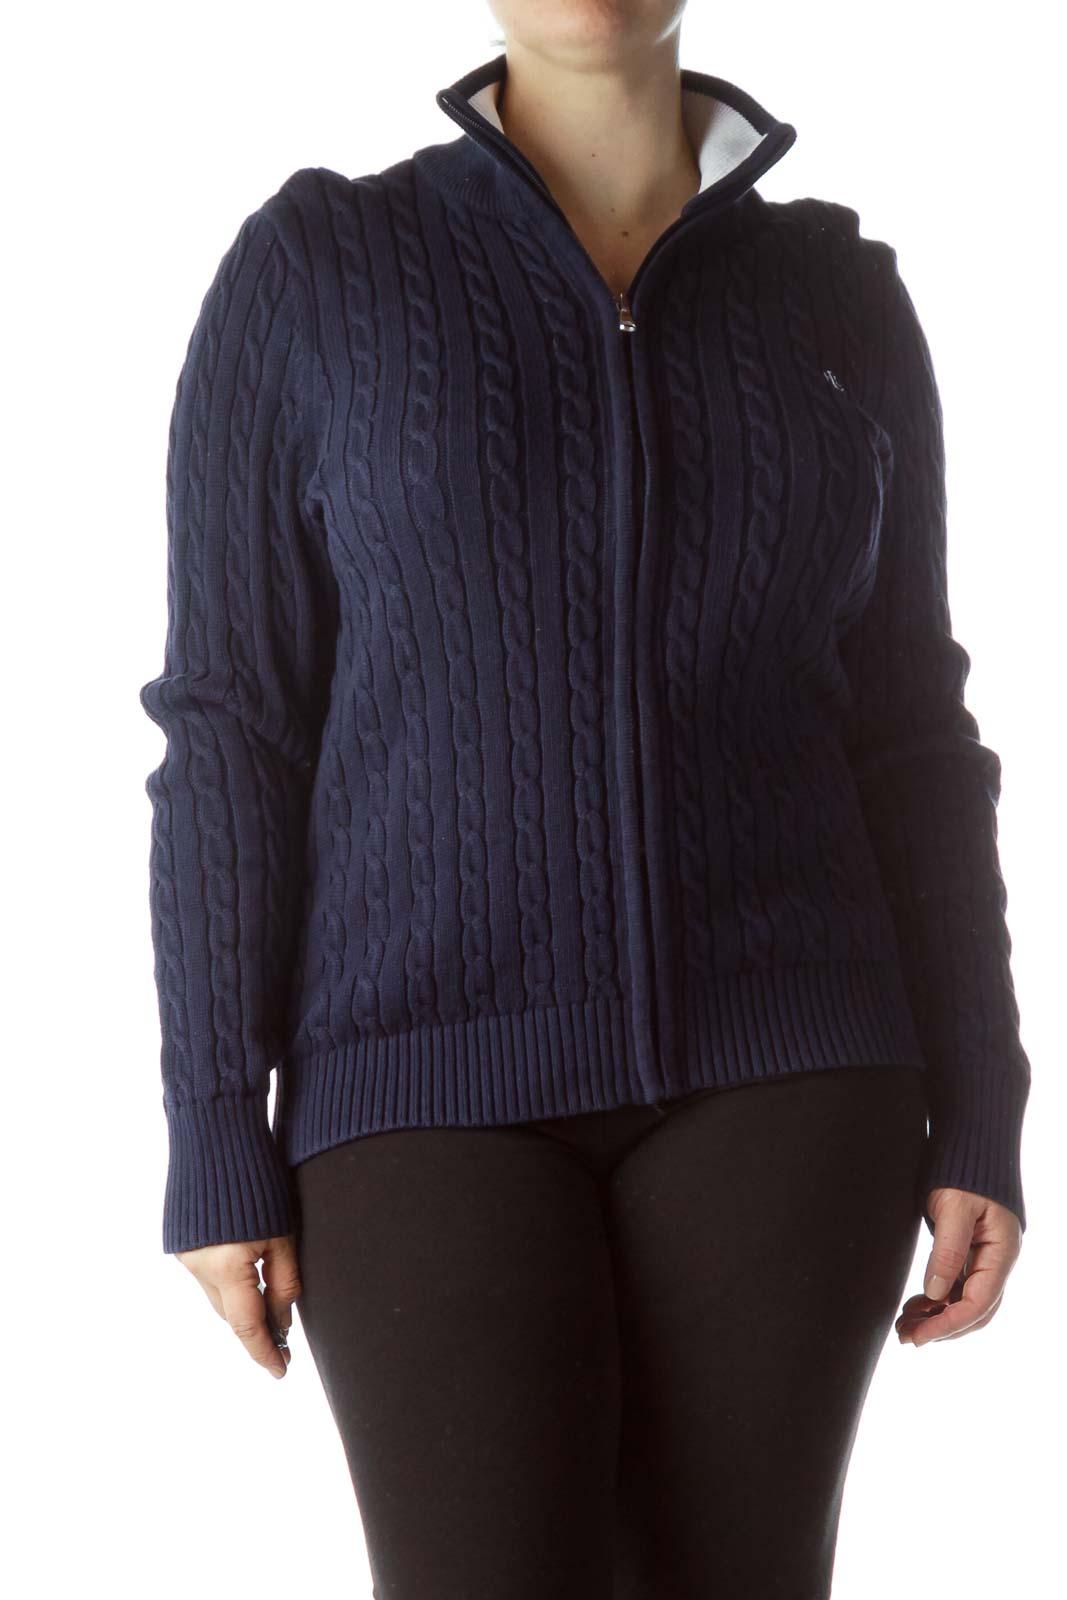 Navy Blue Zippered 100% Cotton Sweater